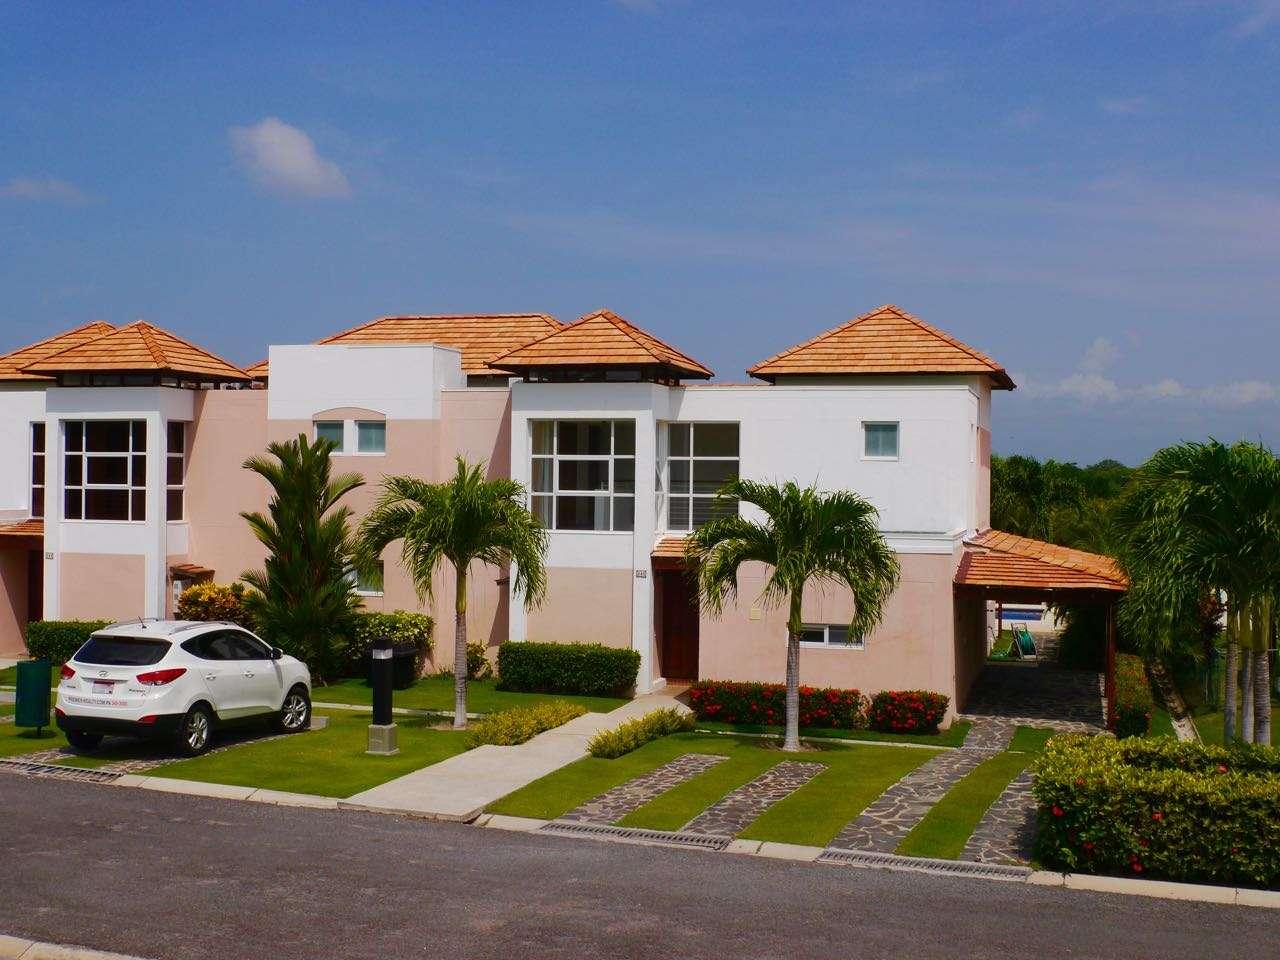 MODERN TOWNHOUSE IN COSTA BLANCA